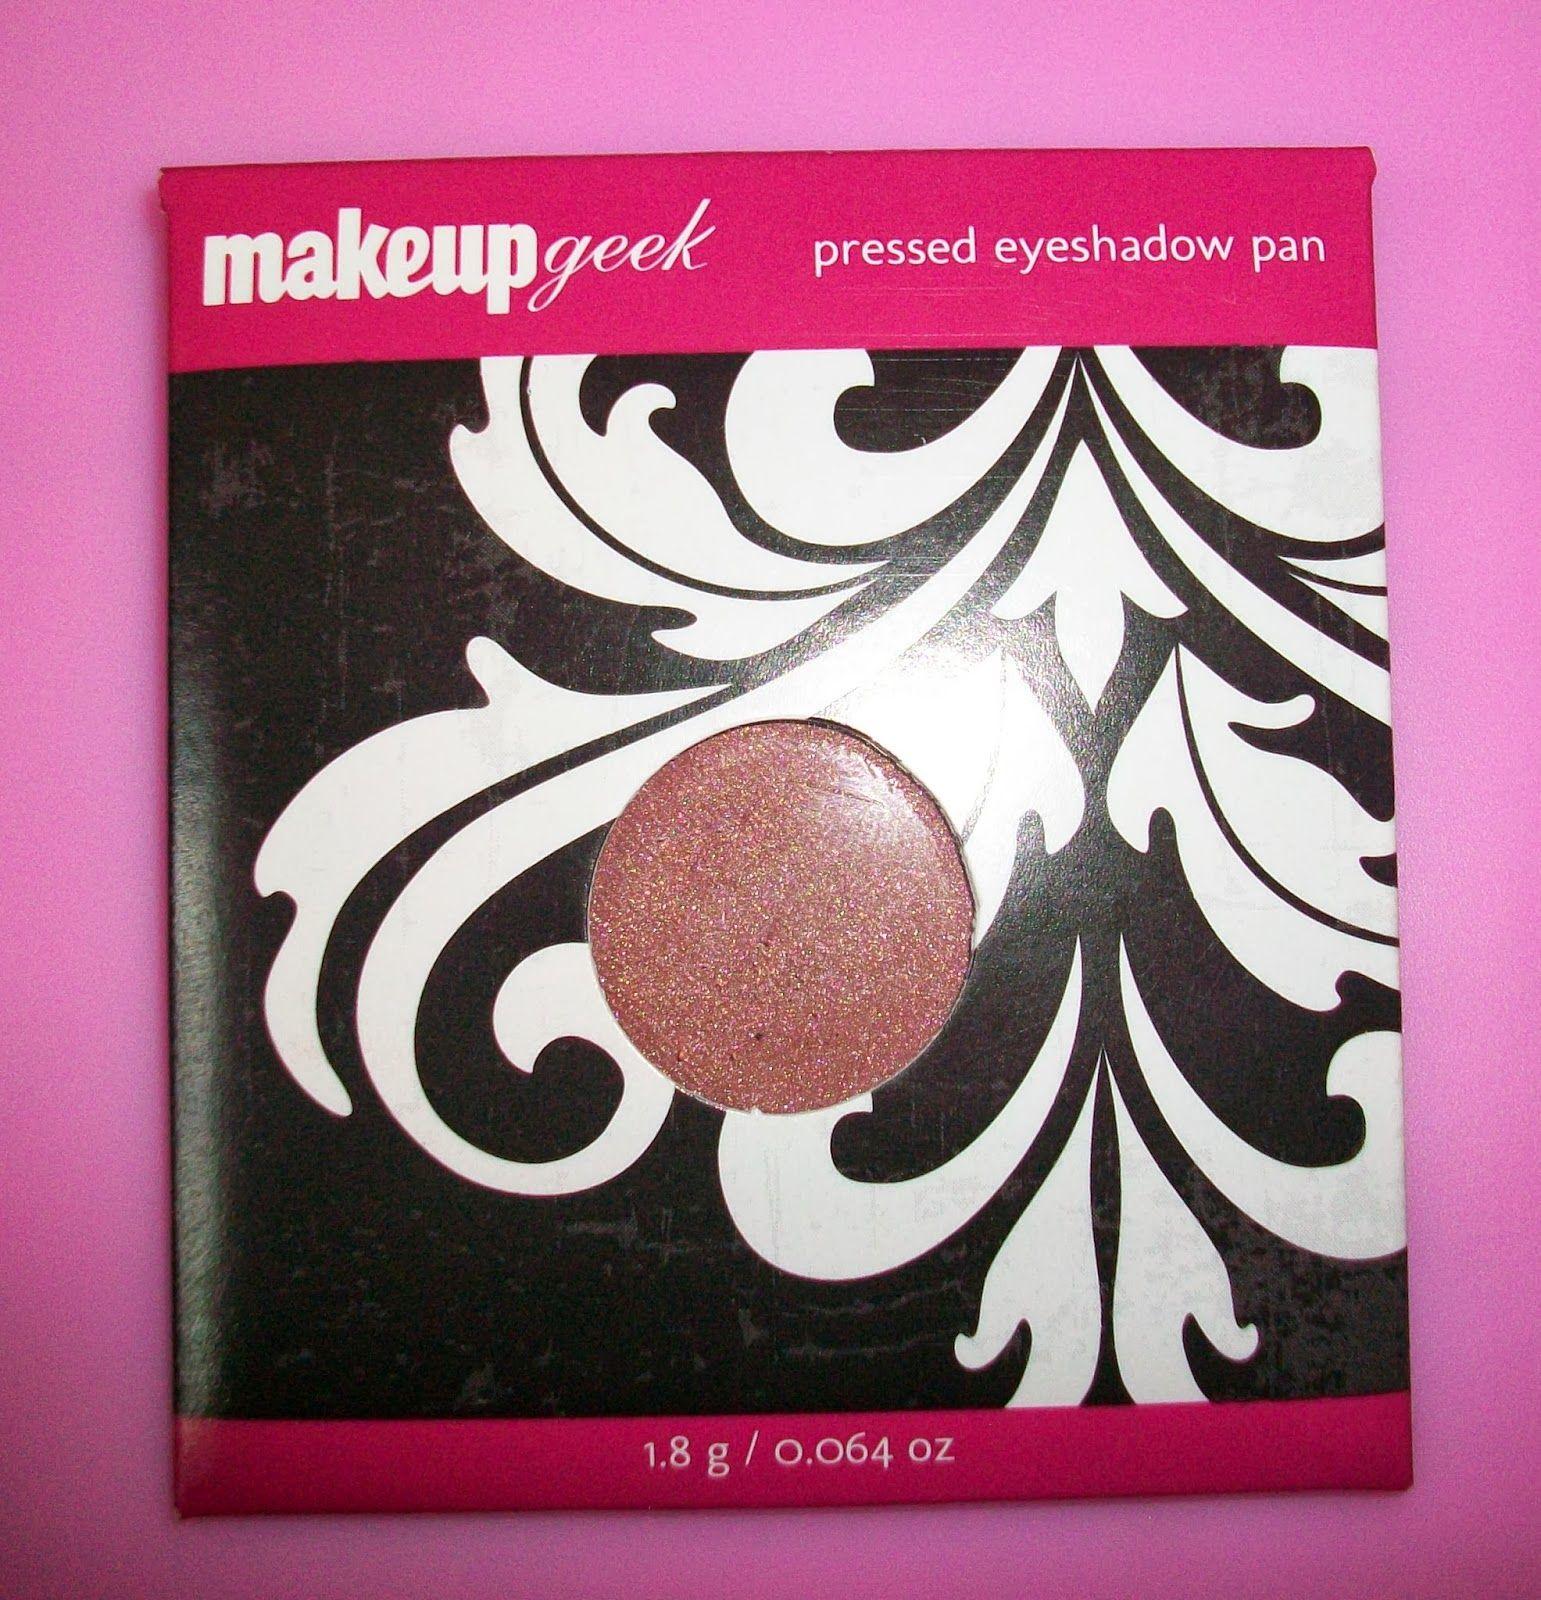 Makeup Geek Eyeshadows and Lipstick Review Makeup geek